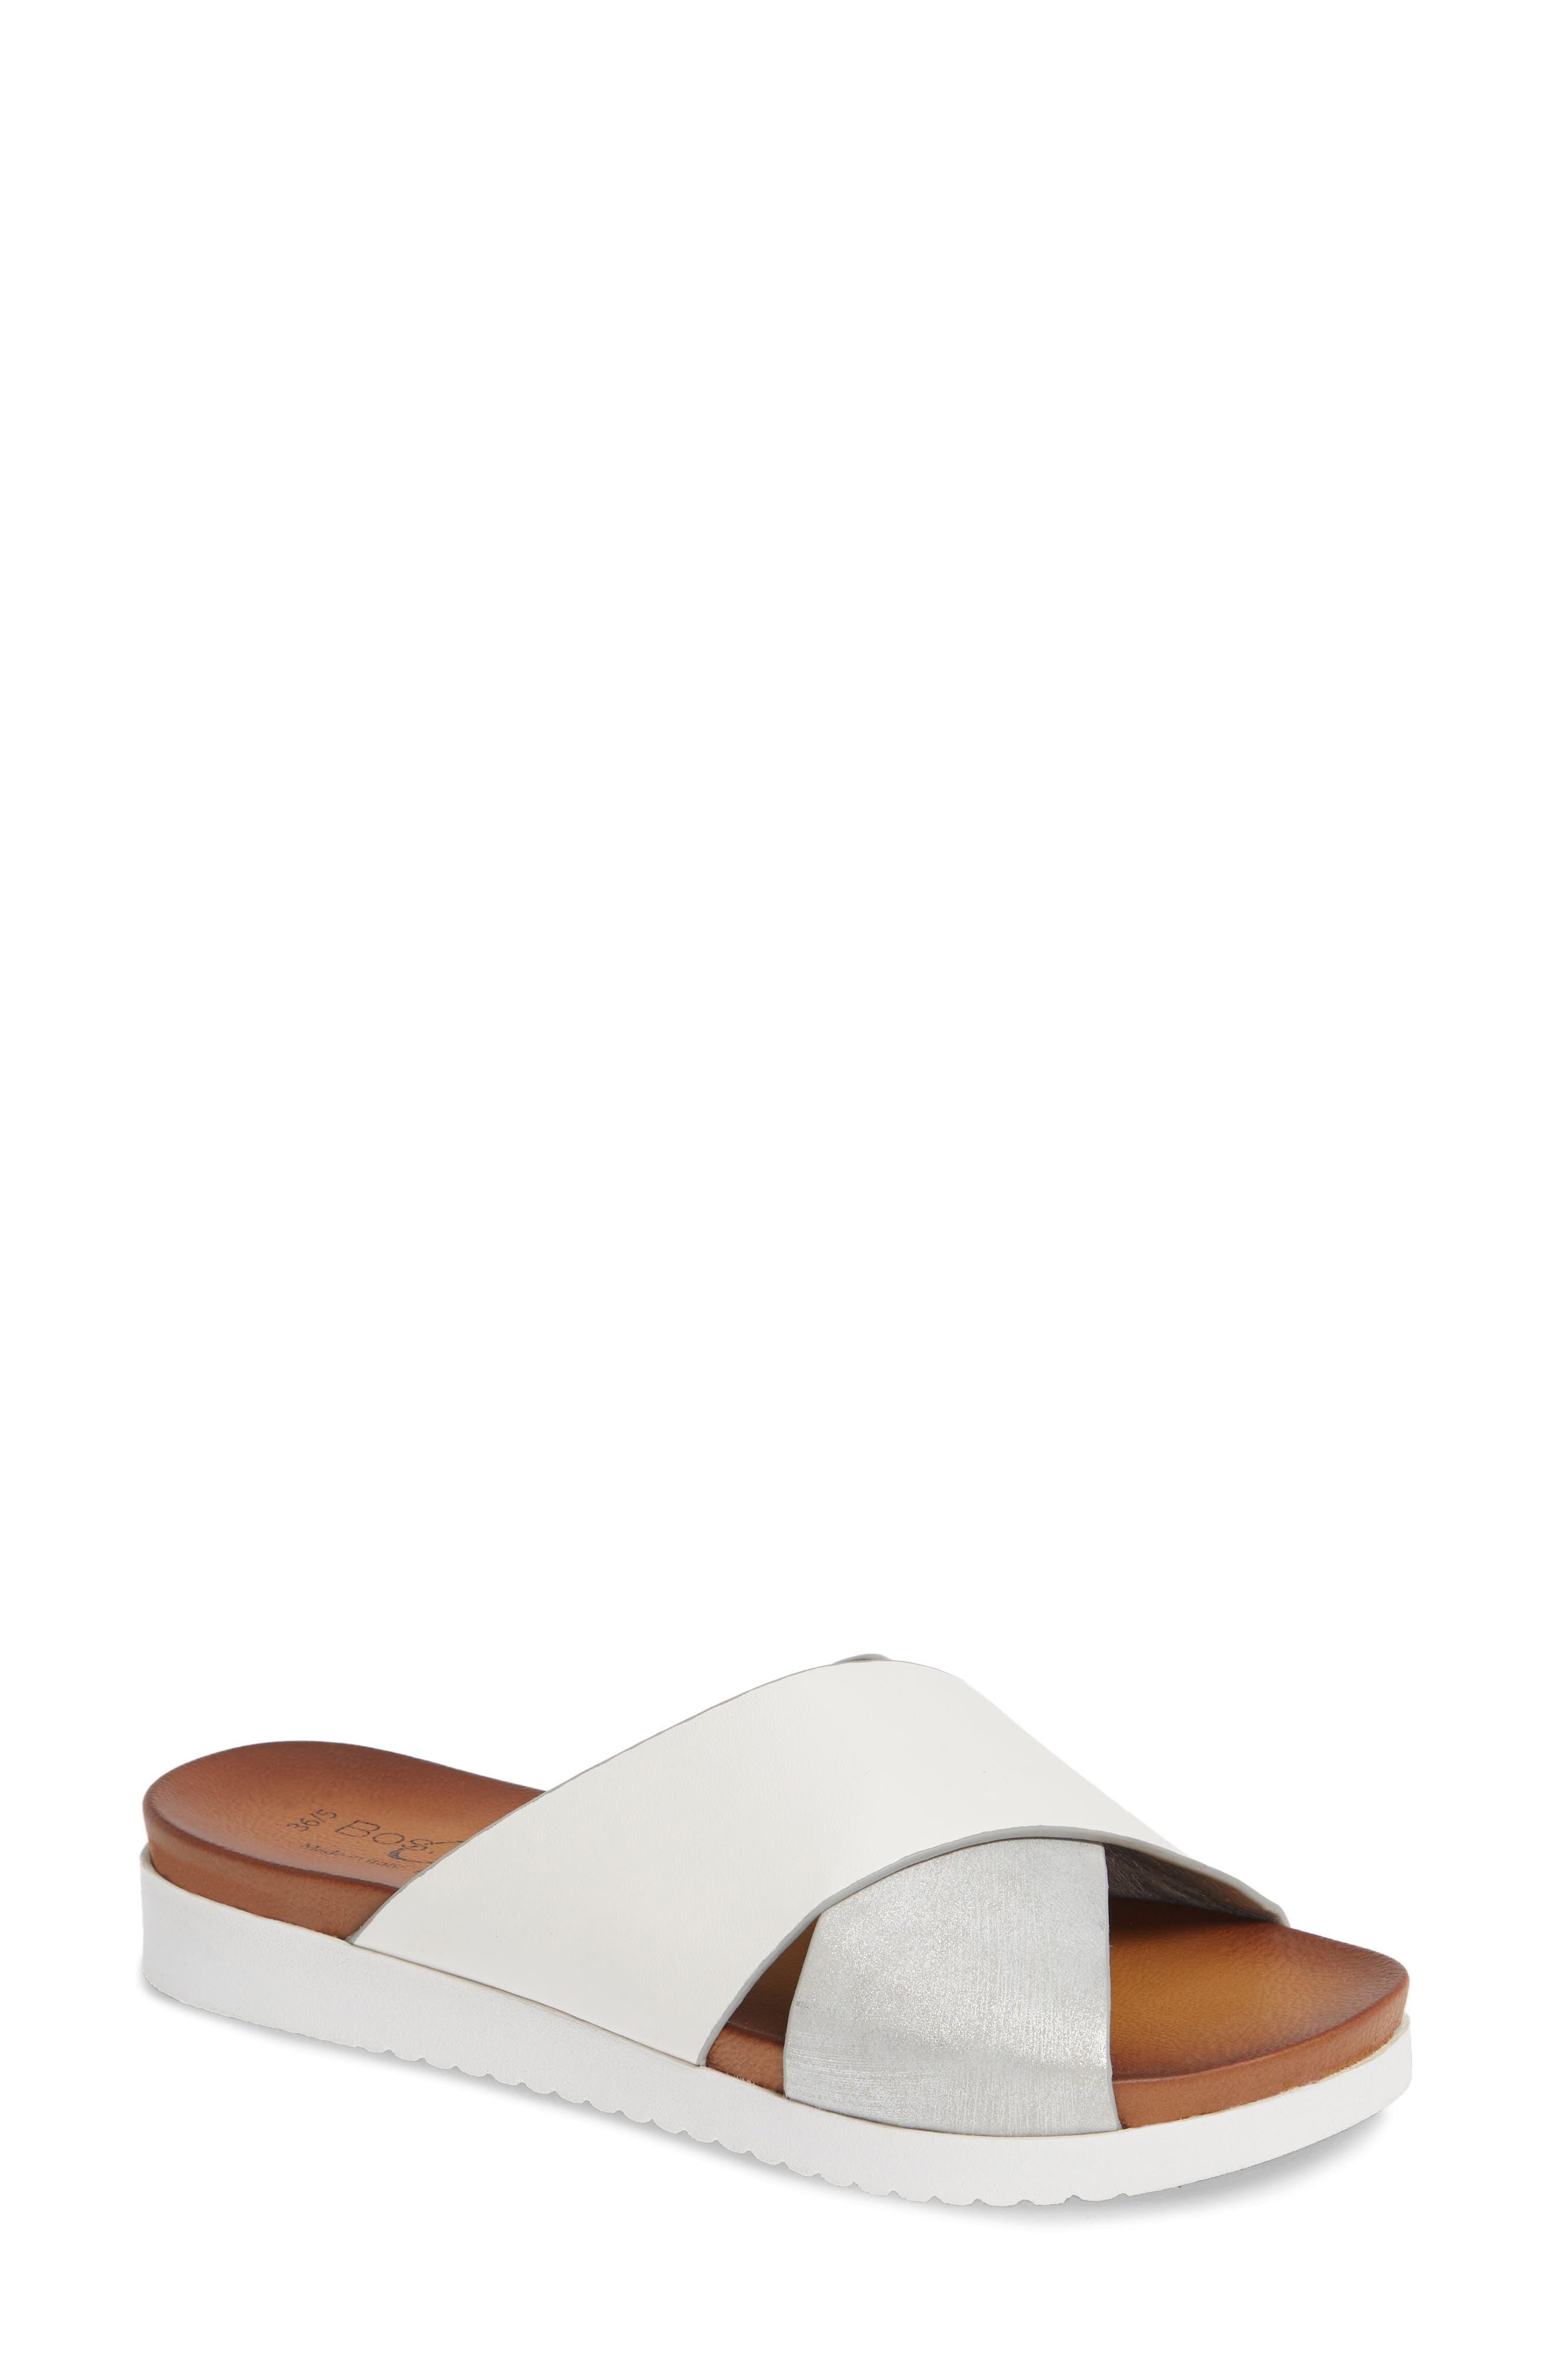 Rwon Slide Sandal, Main, color, WHITE/ SILVER LEATHER